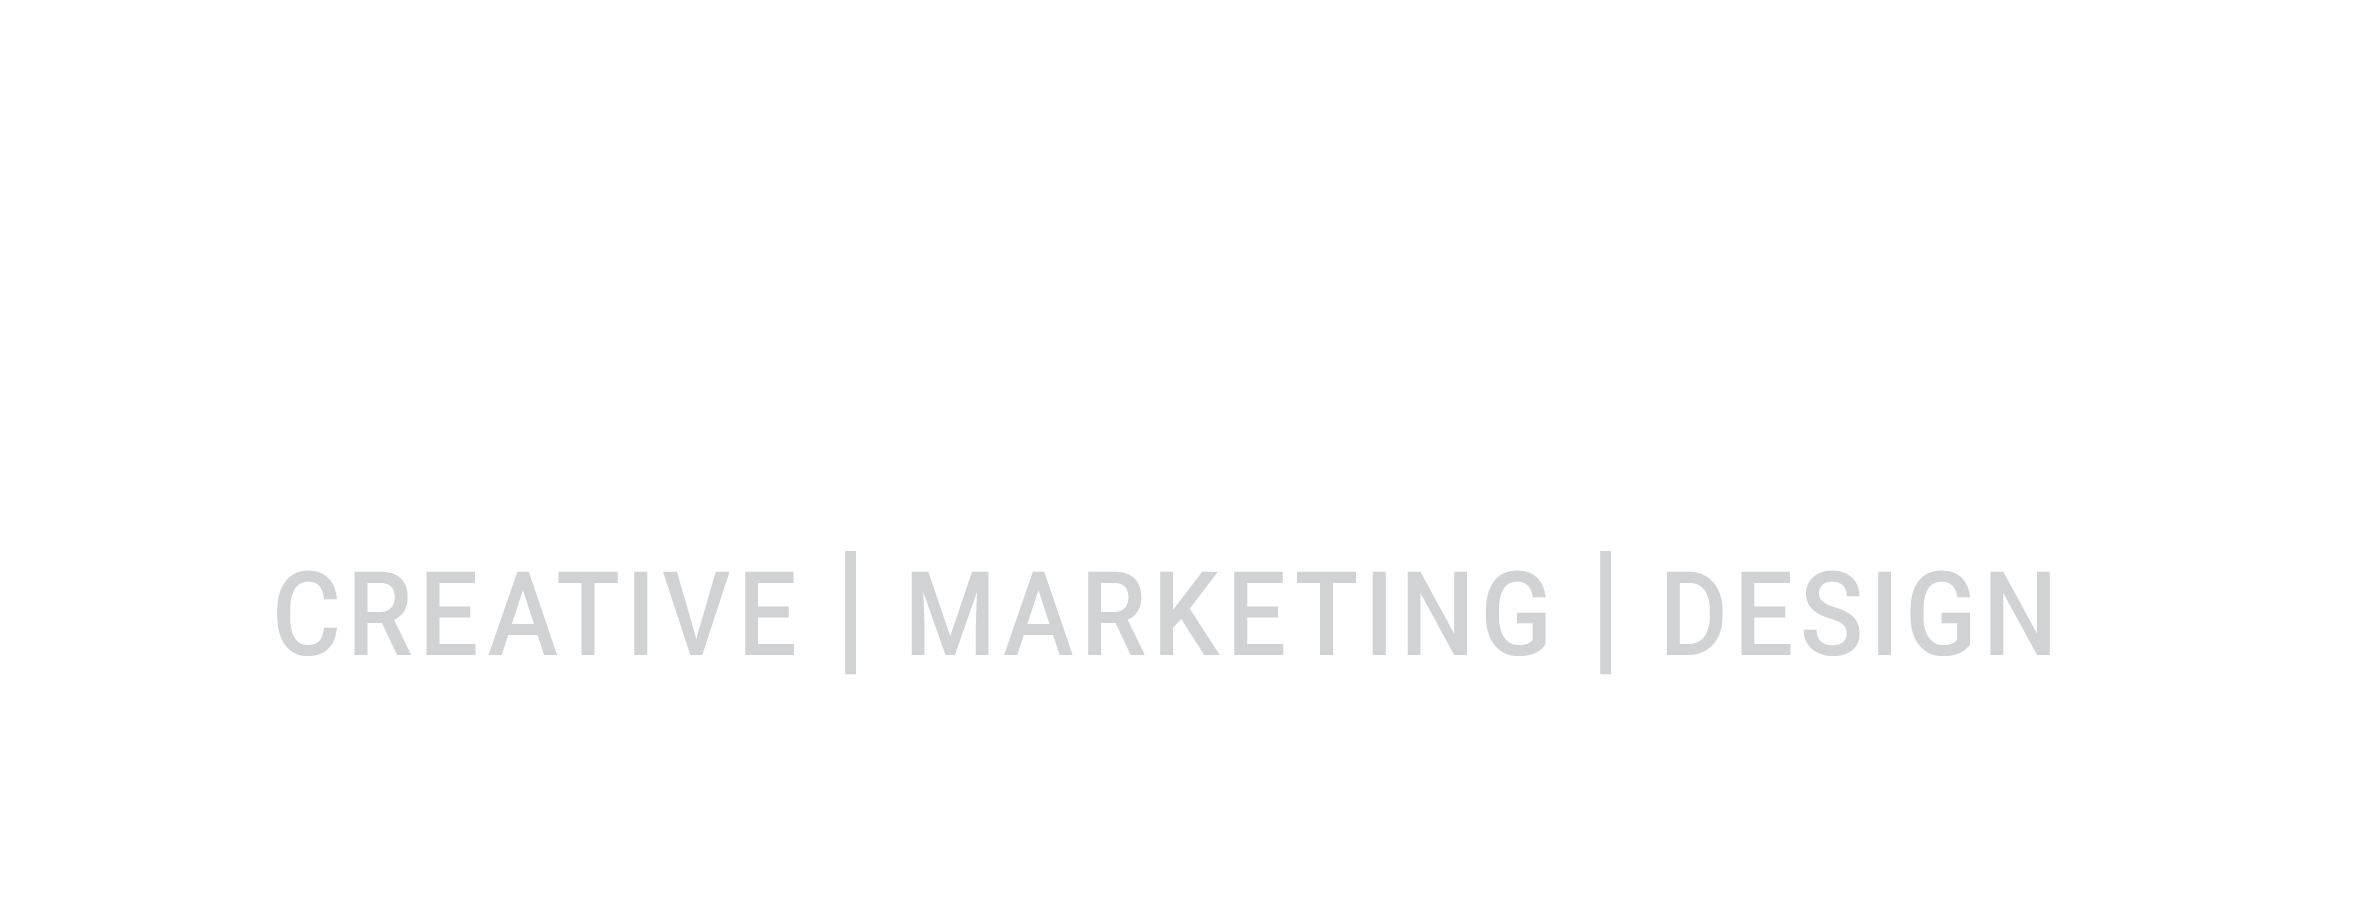 Branding by Paul